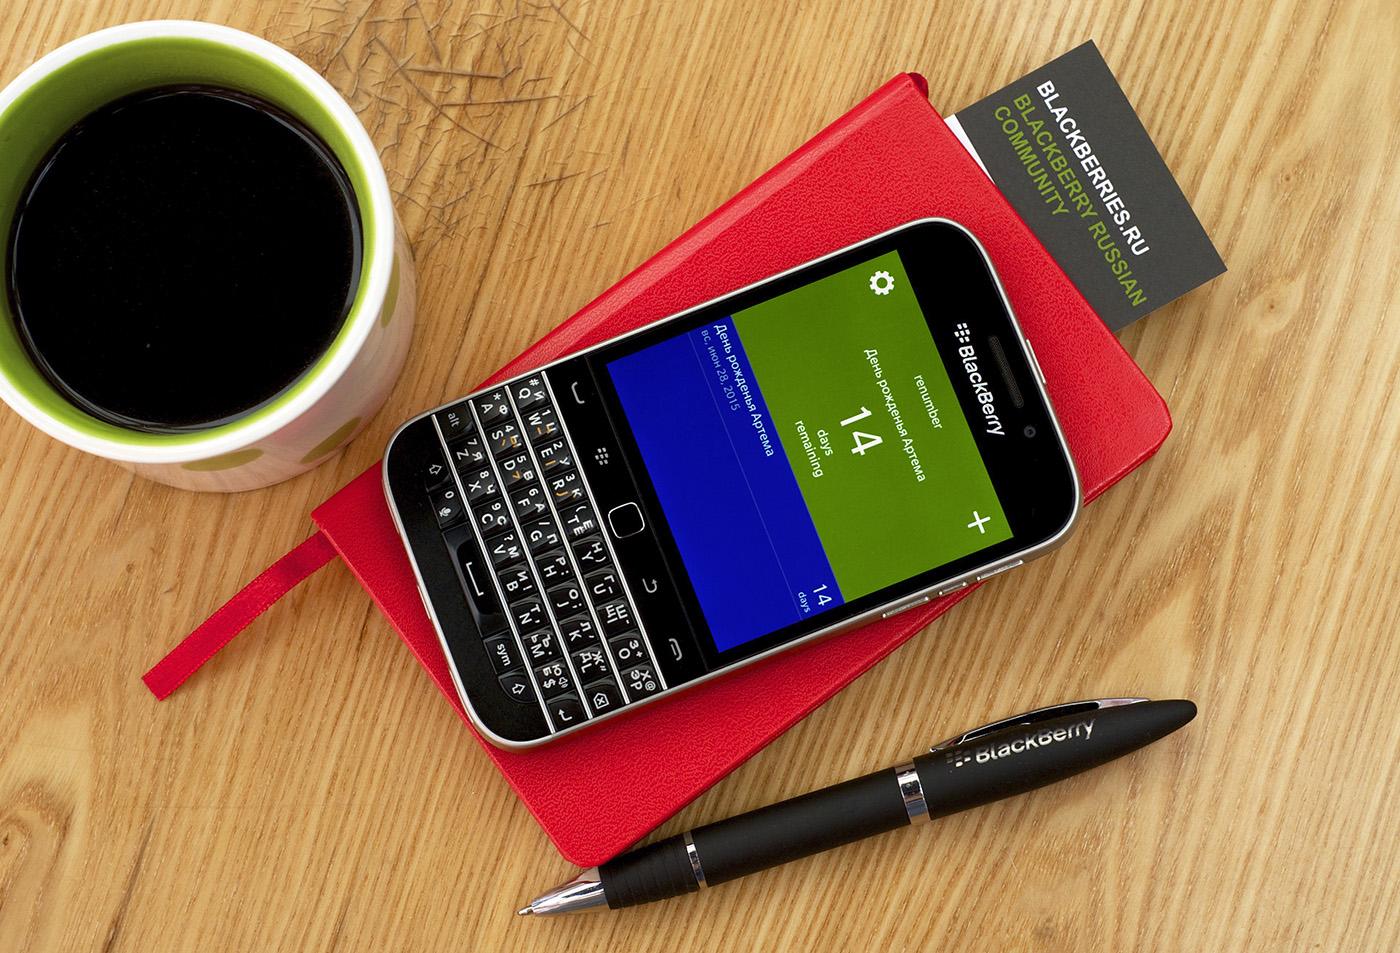 BlackBerry-Classic-Apps-2